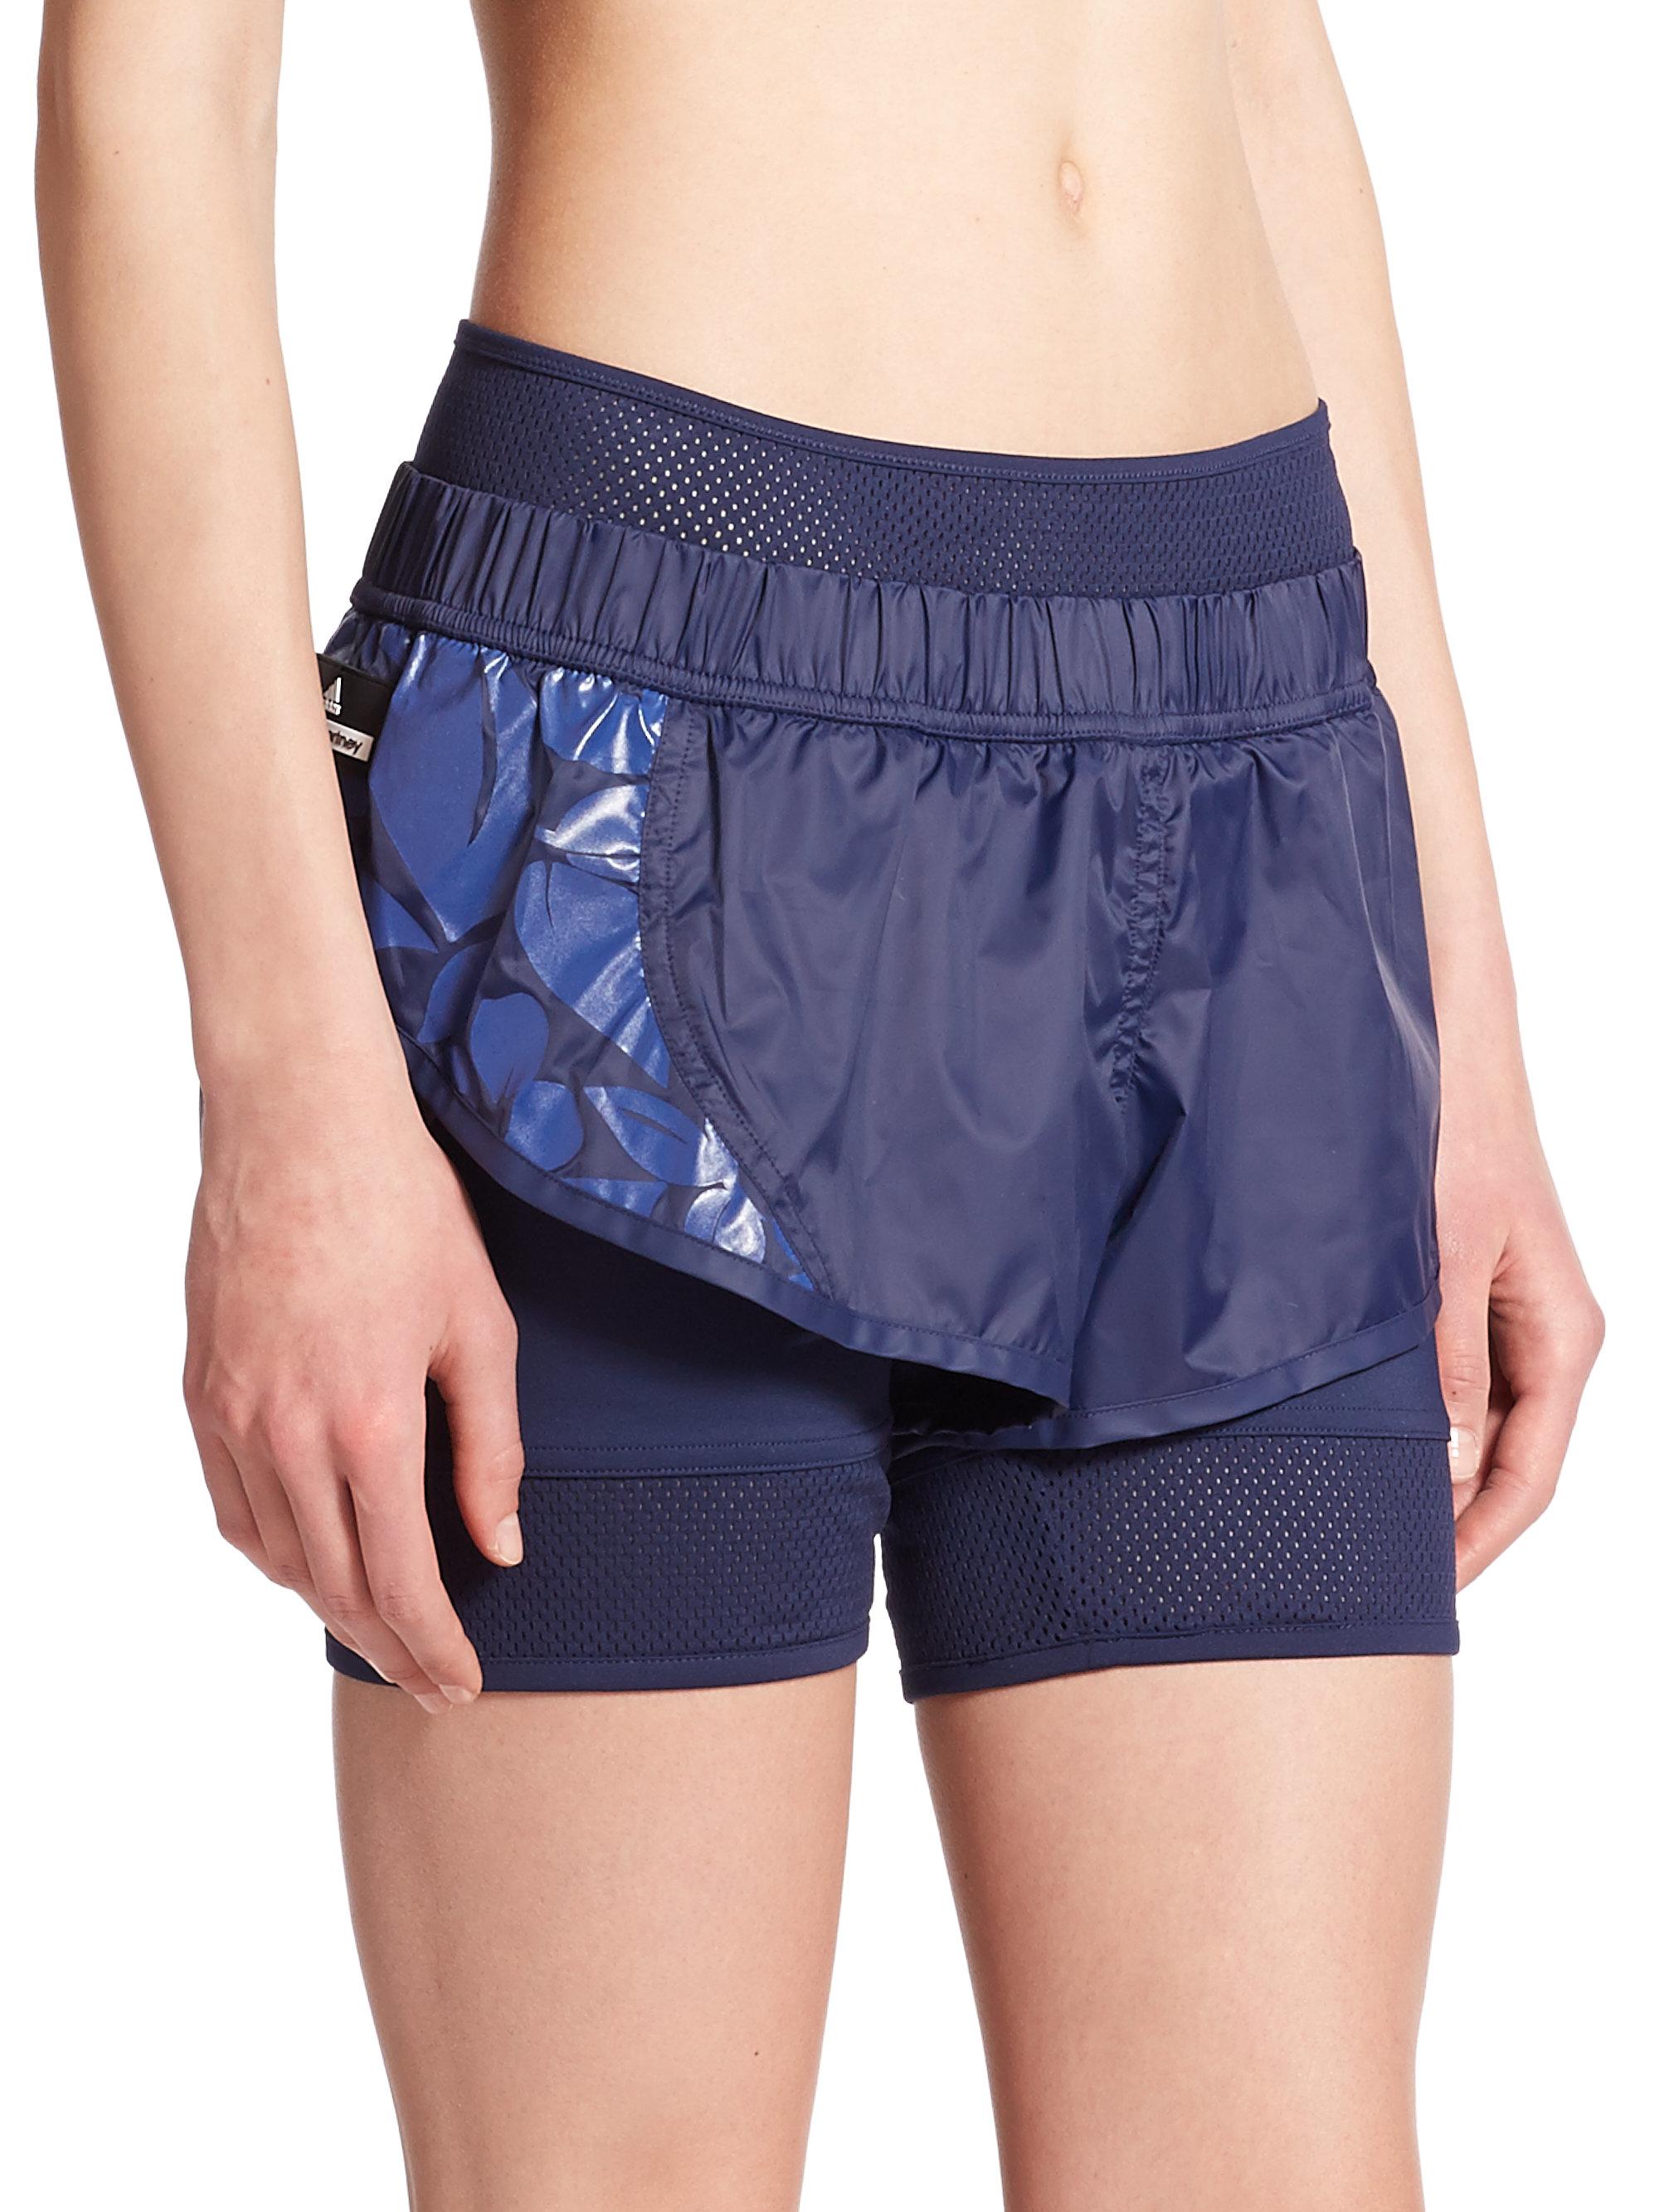 Adidas Women's Clothing